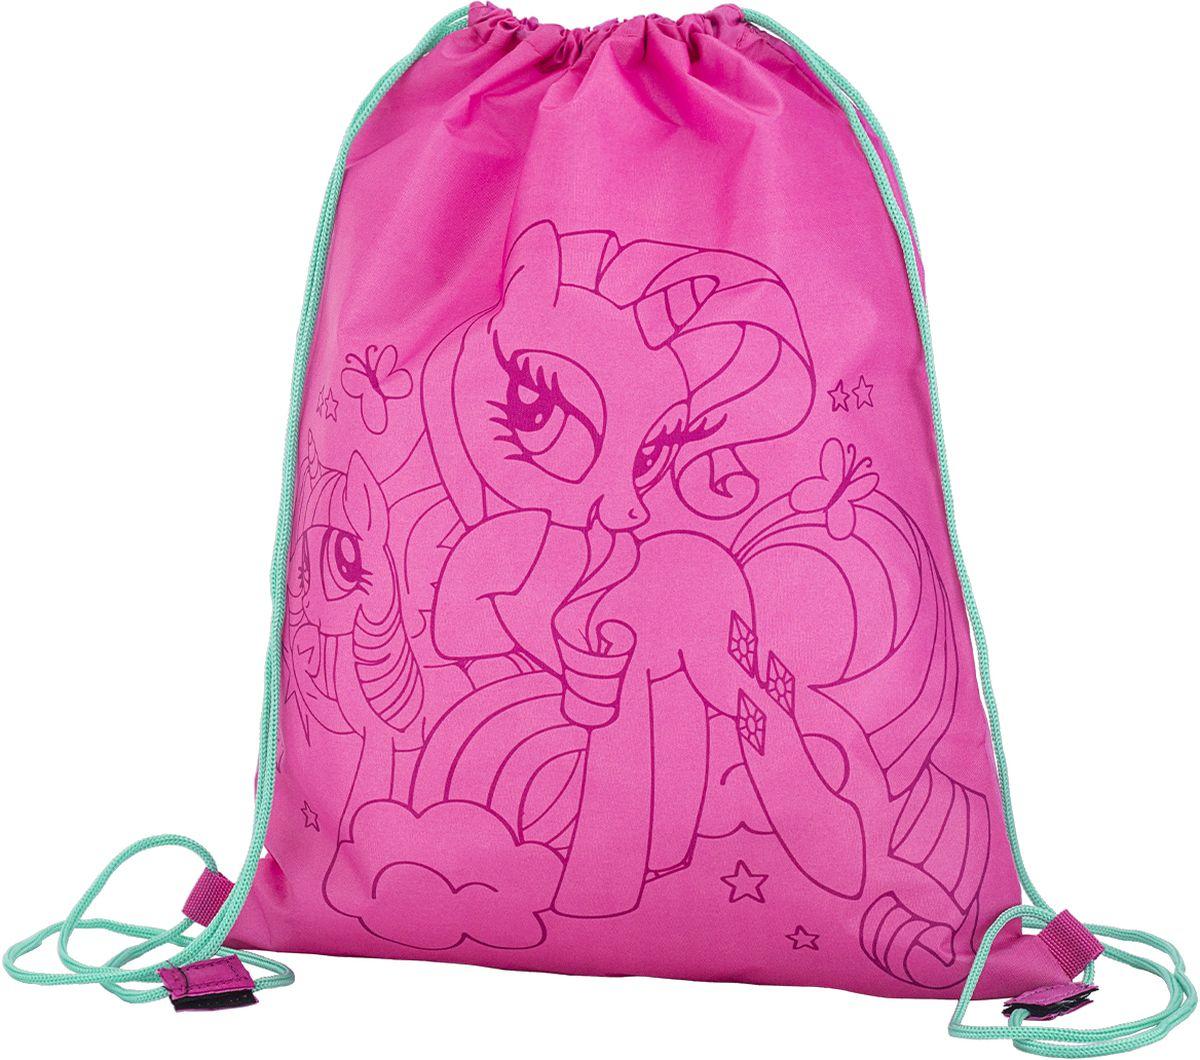 My Little Pony Сумка для сменной обуви MPEB-MT2-883 сумка kinderline international mhbz us1 51box5 v3